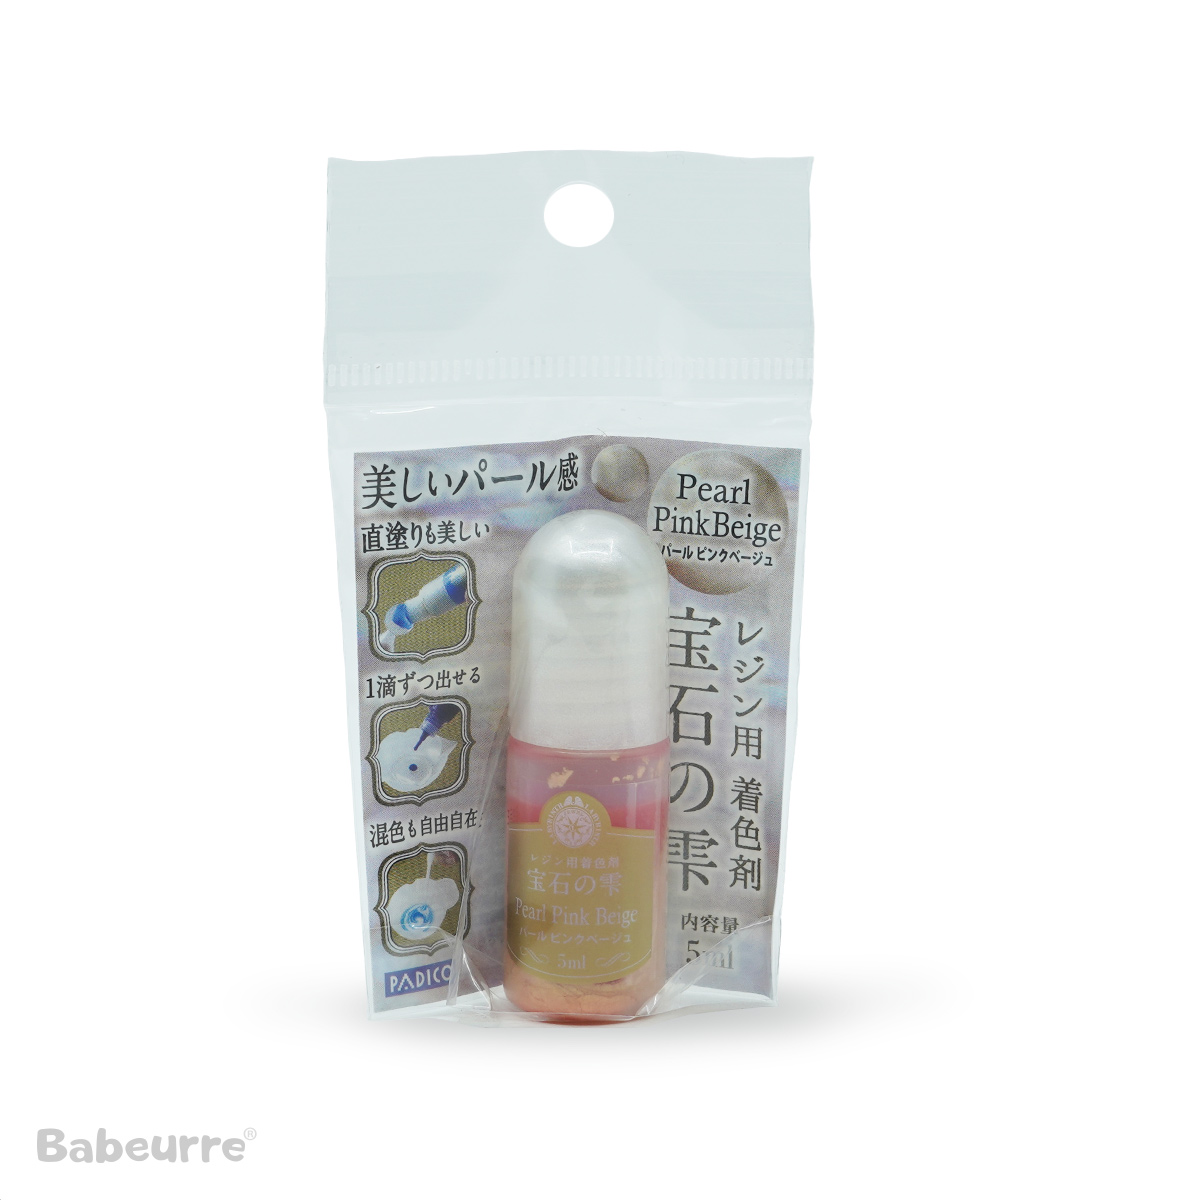 Padico pigment pearl pink beige